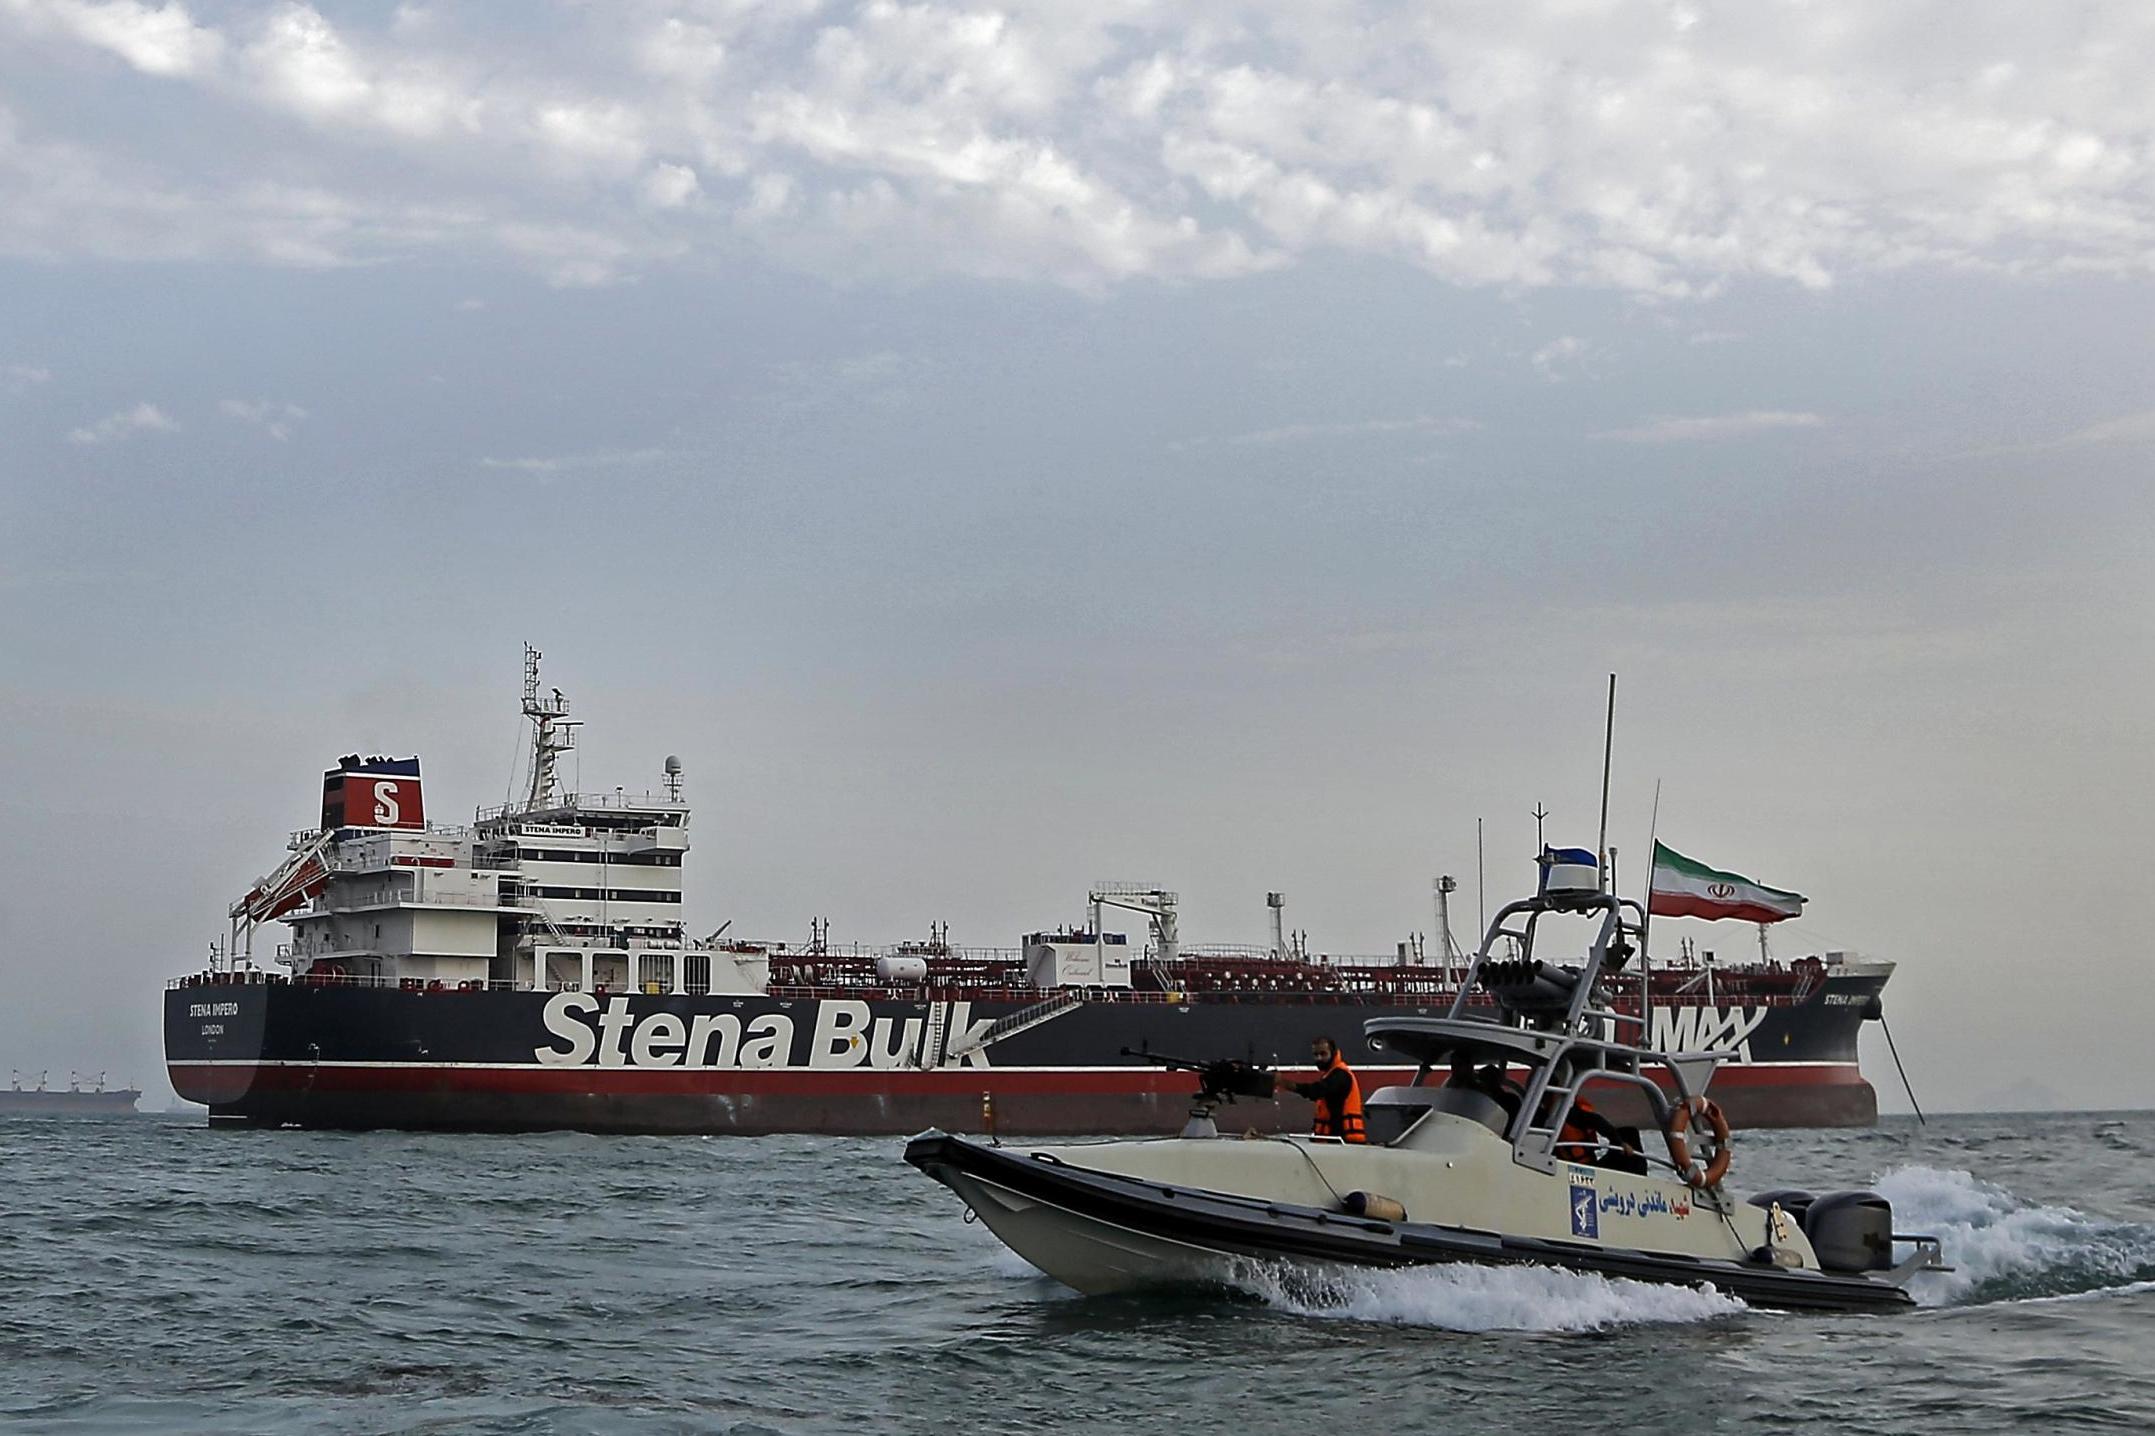 British-Iranian academic arrested in Iran amid tanker row